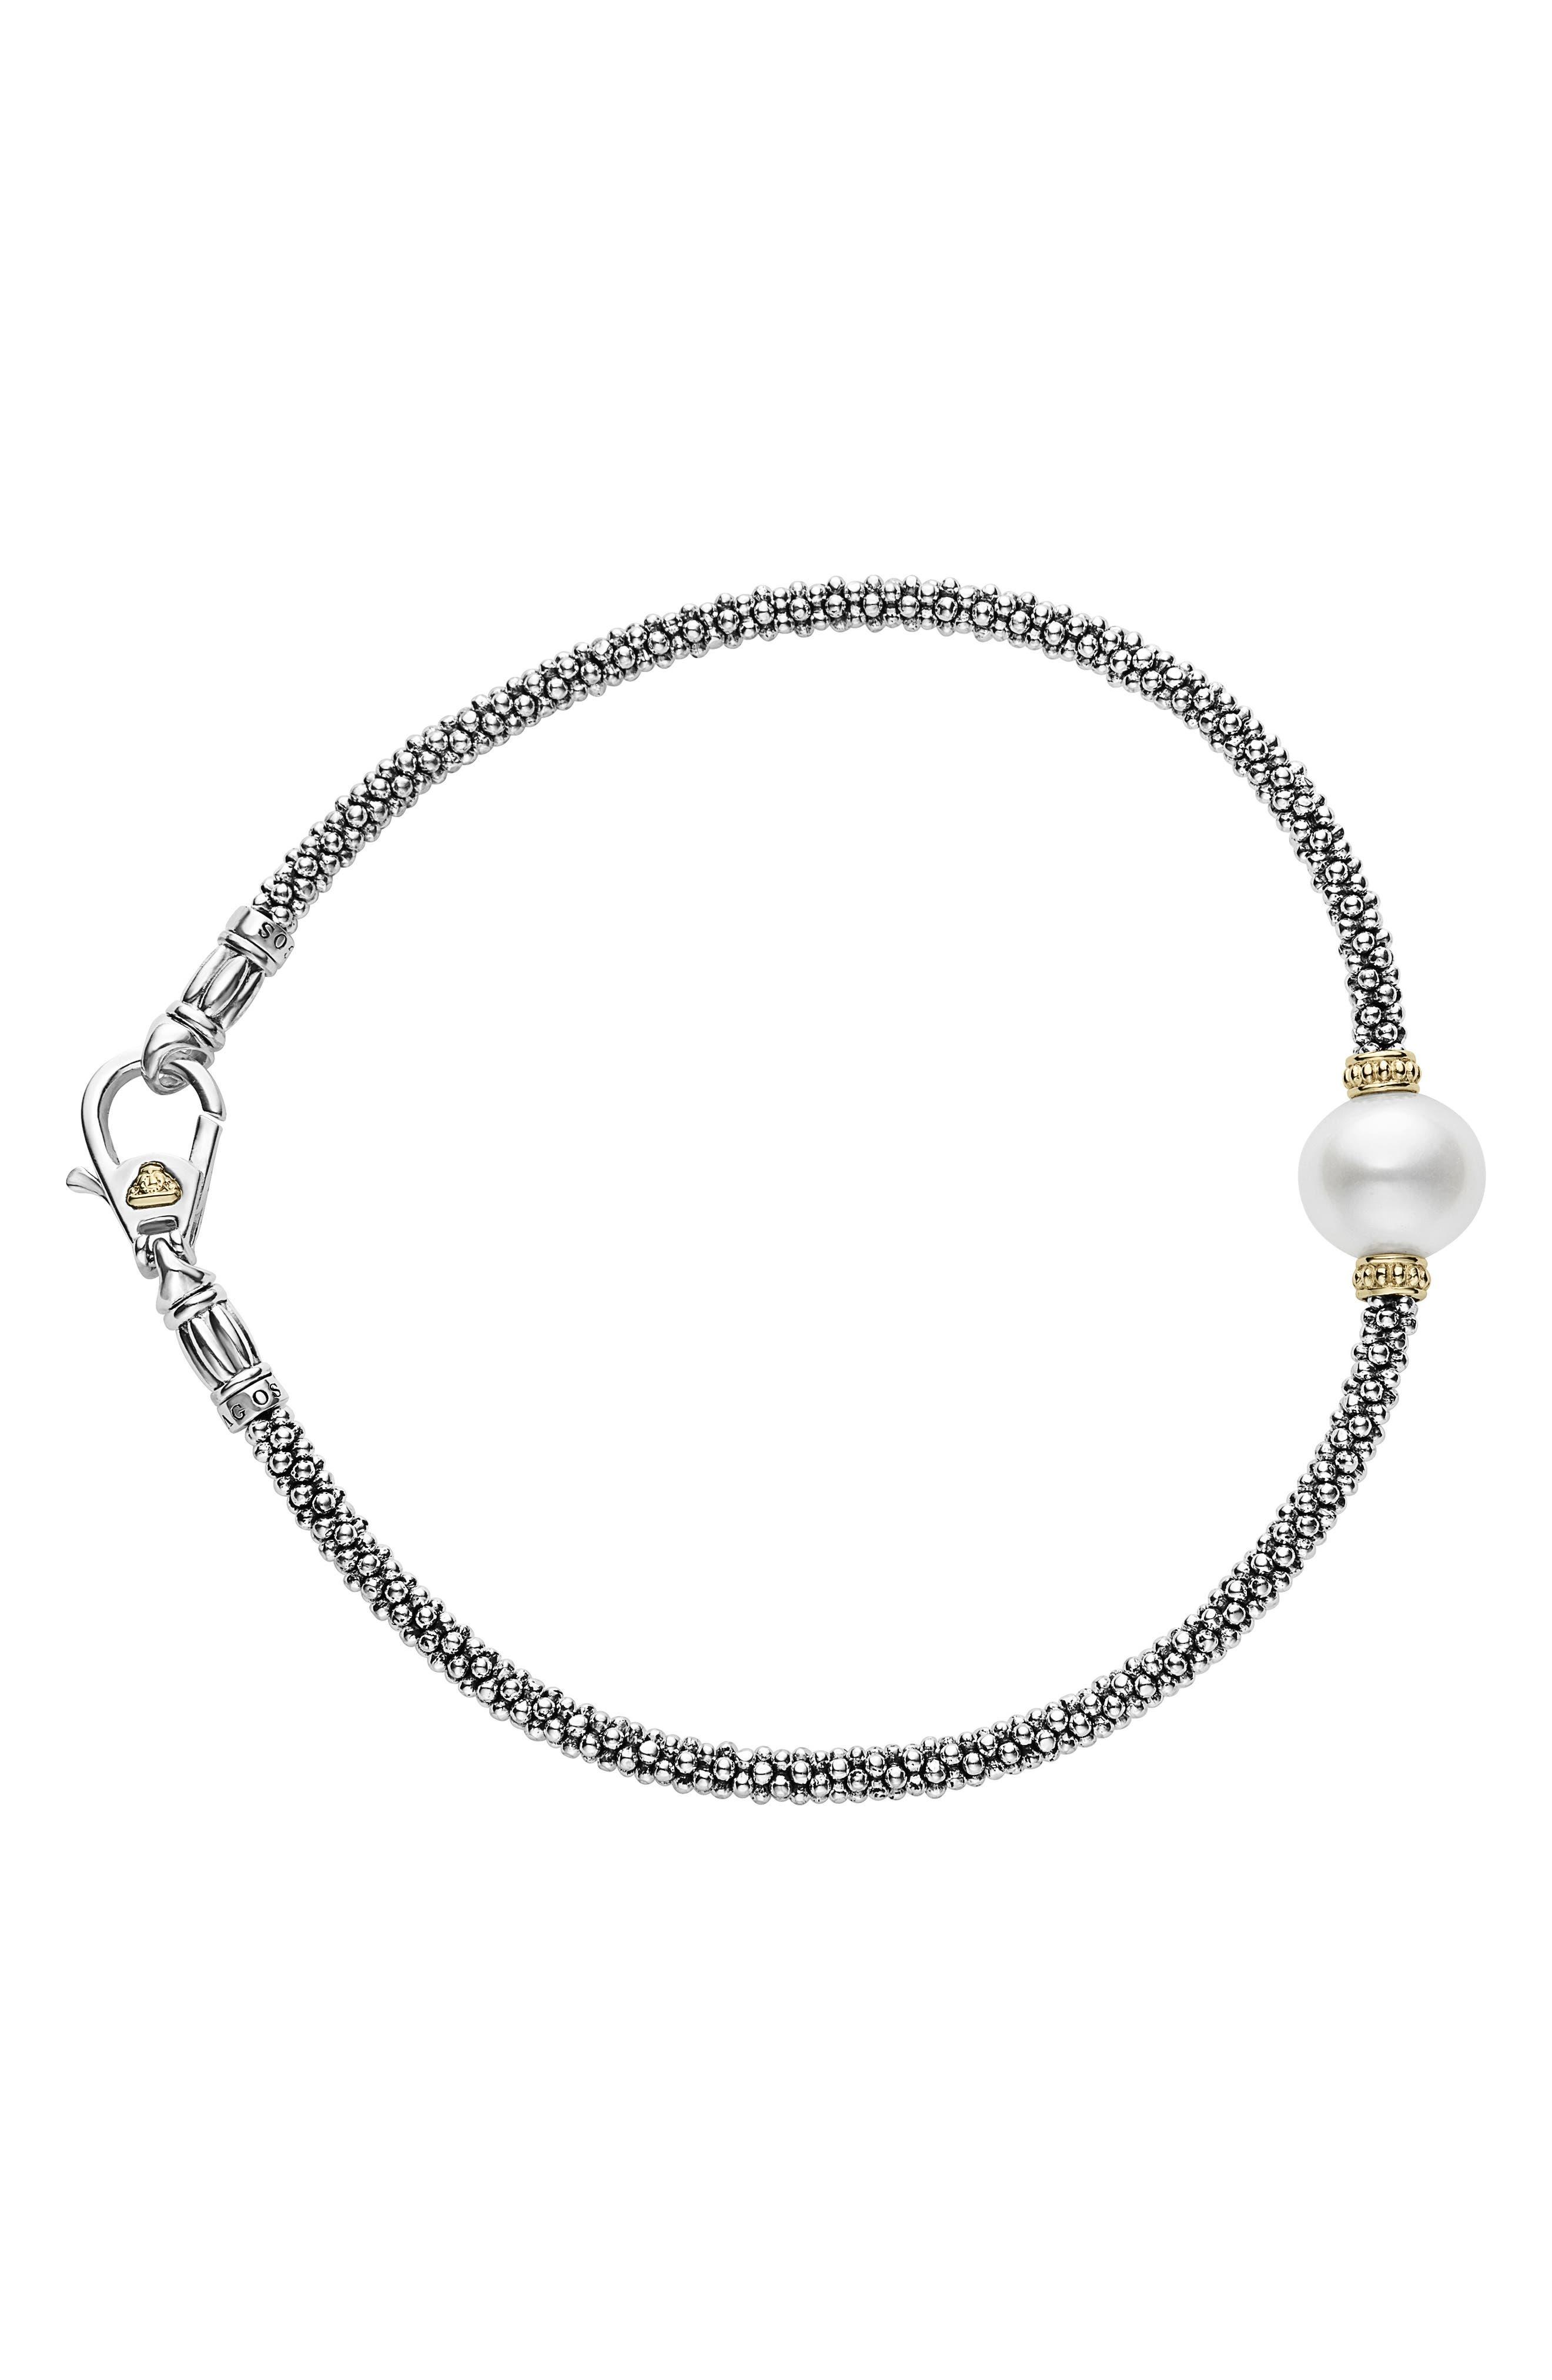 Main Image - LAGOS Luna Pearl Single Station Caviar Bracelet